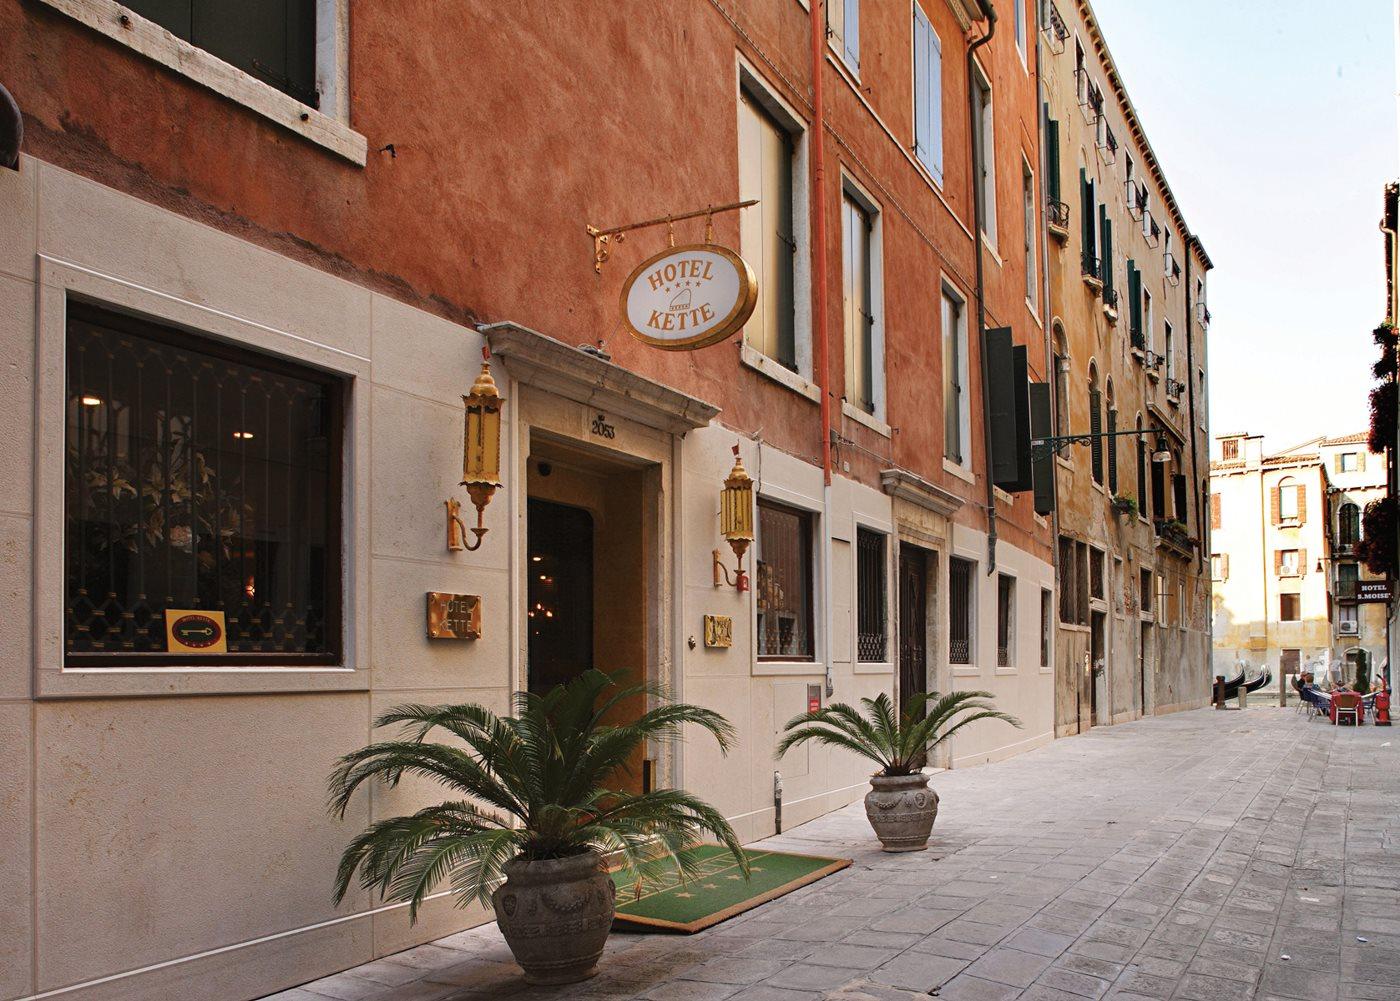 Hotel Kette, Venice, Italy